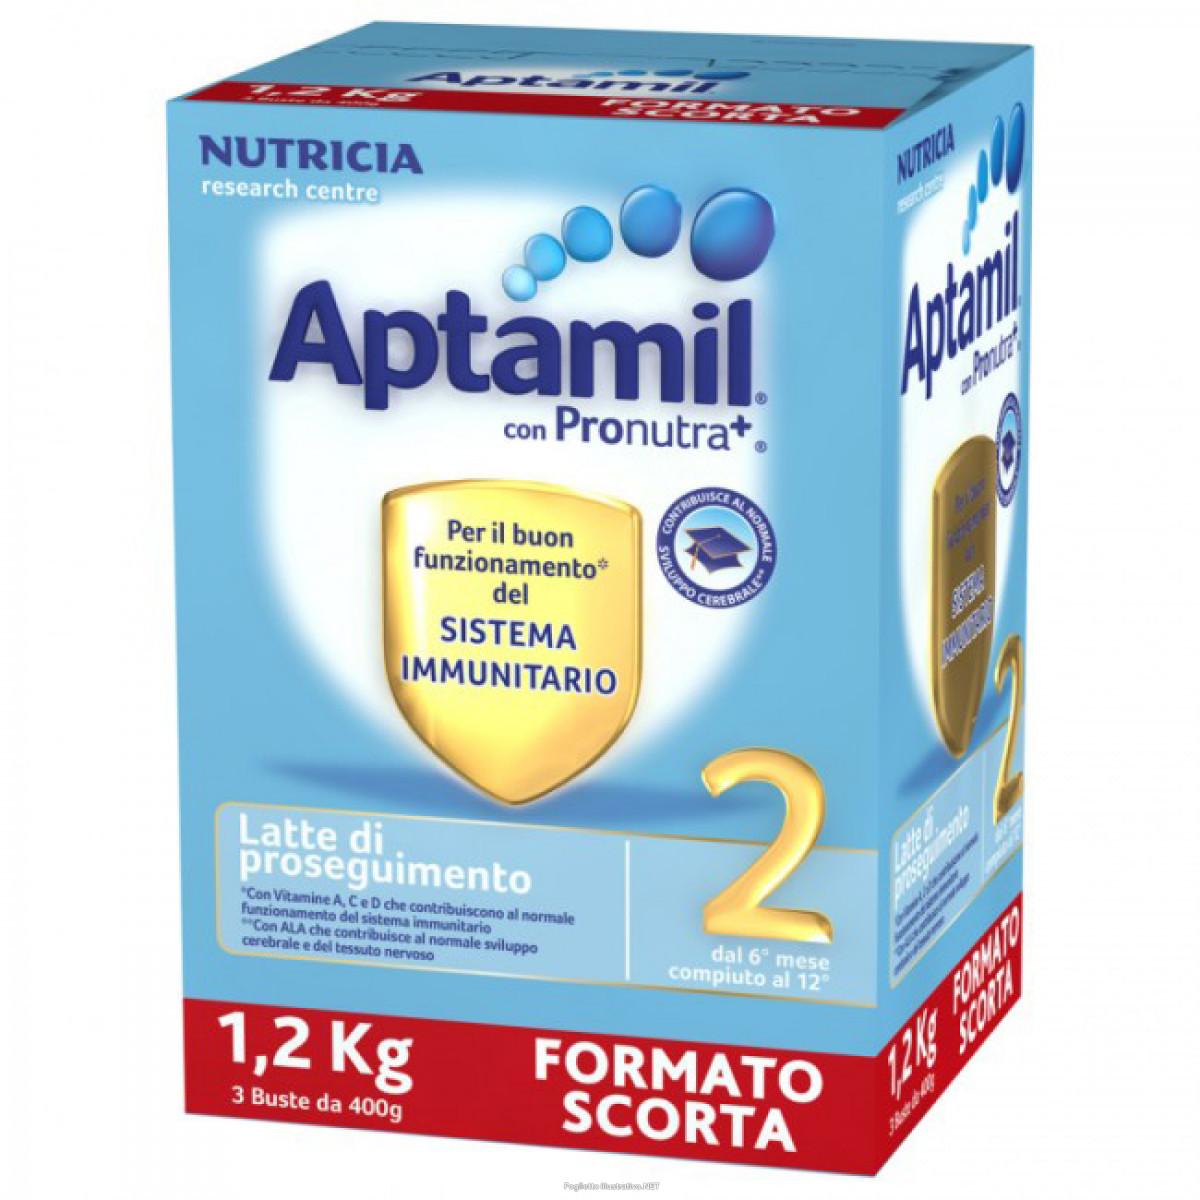 Image of Aptamil 2 Latte Di Proseguimento Nutricia 1200g